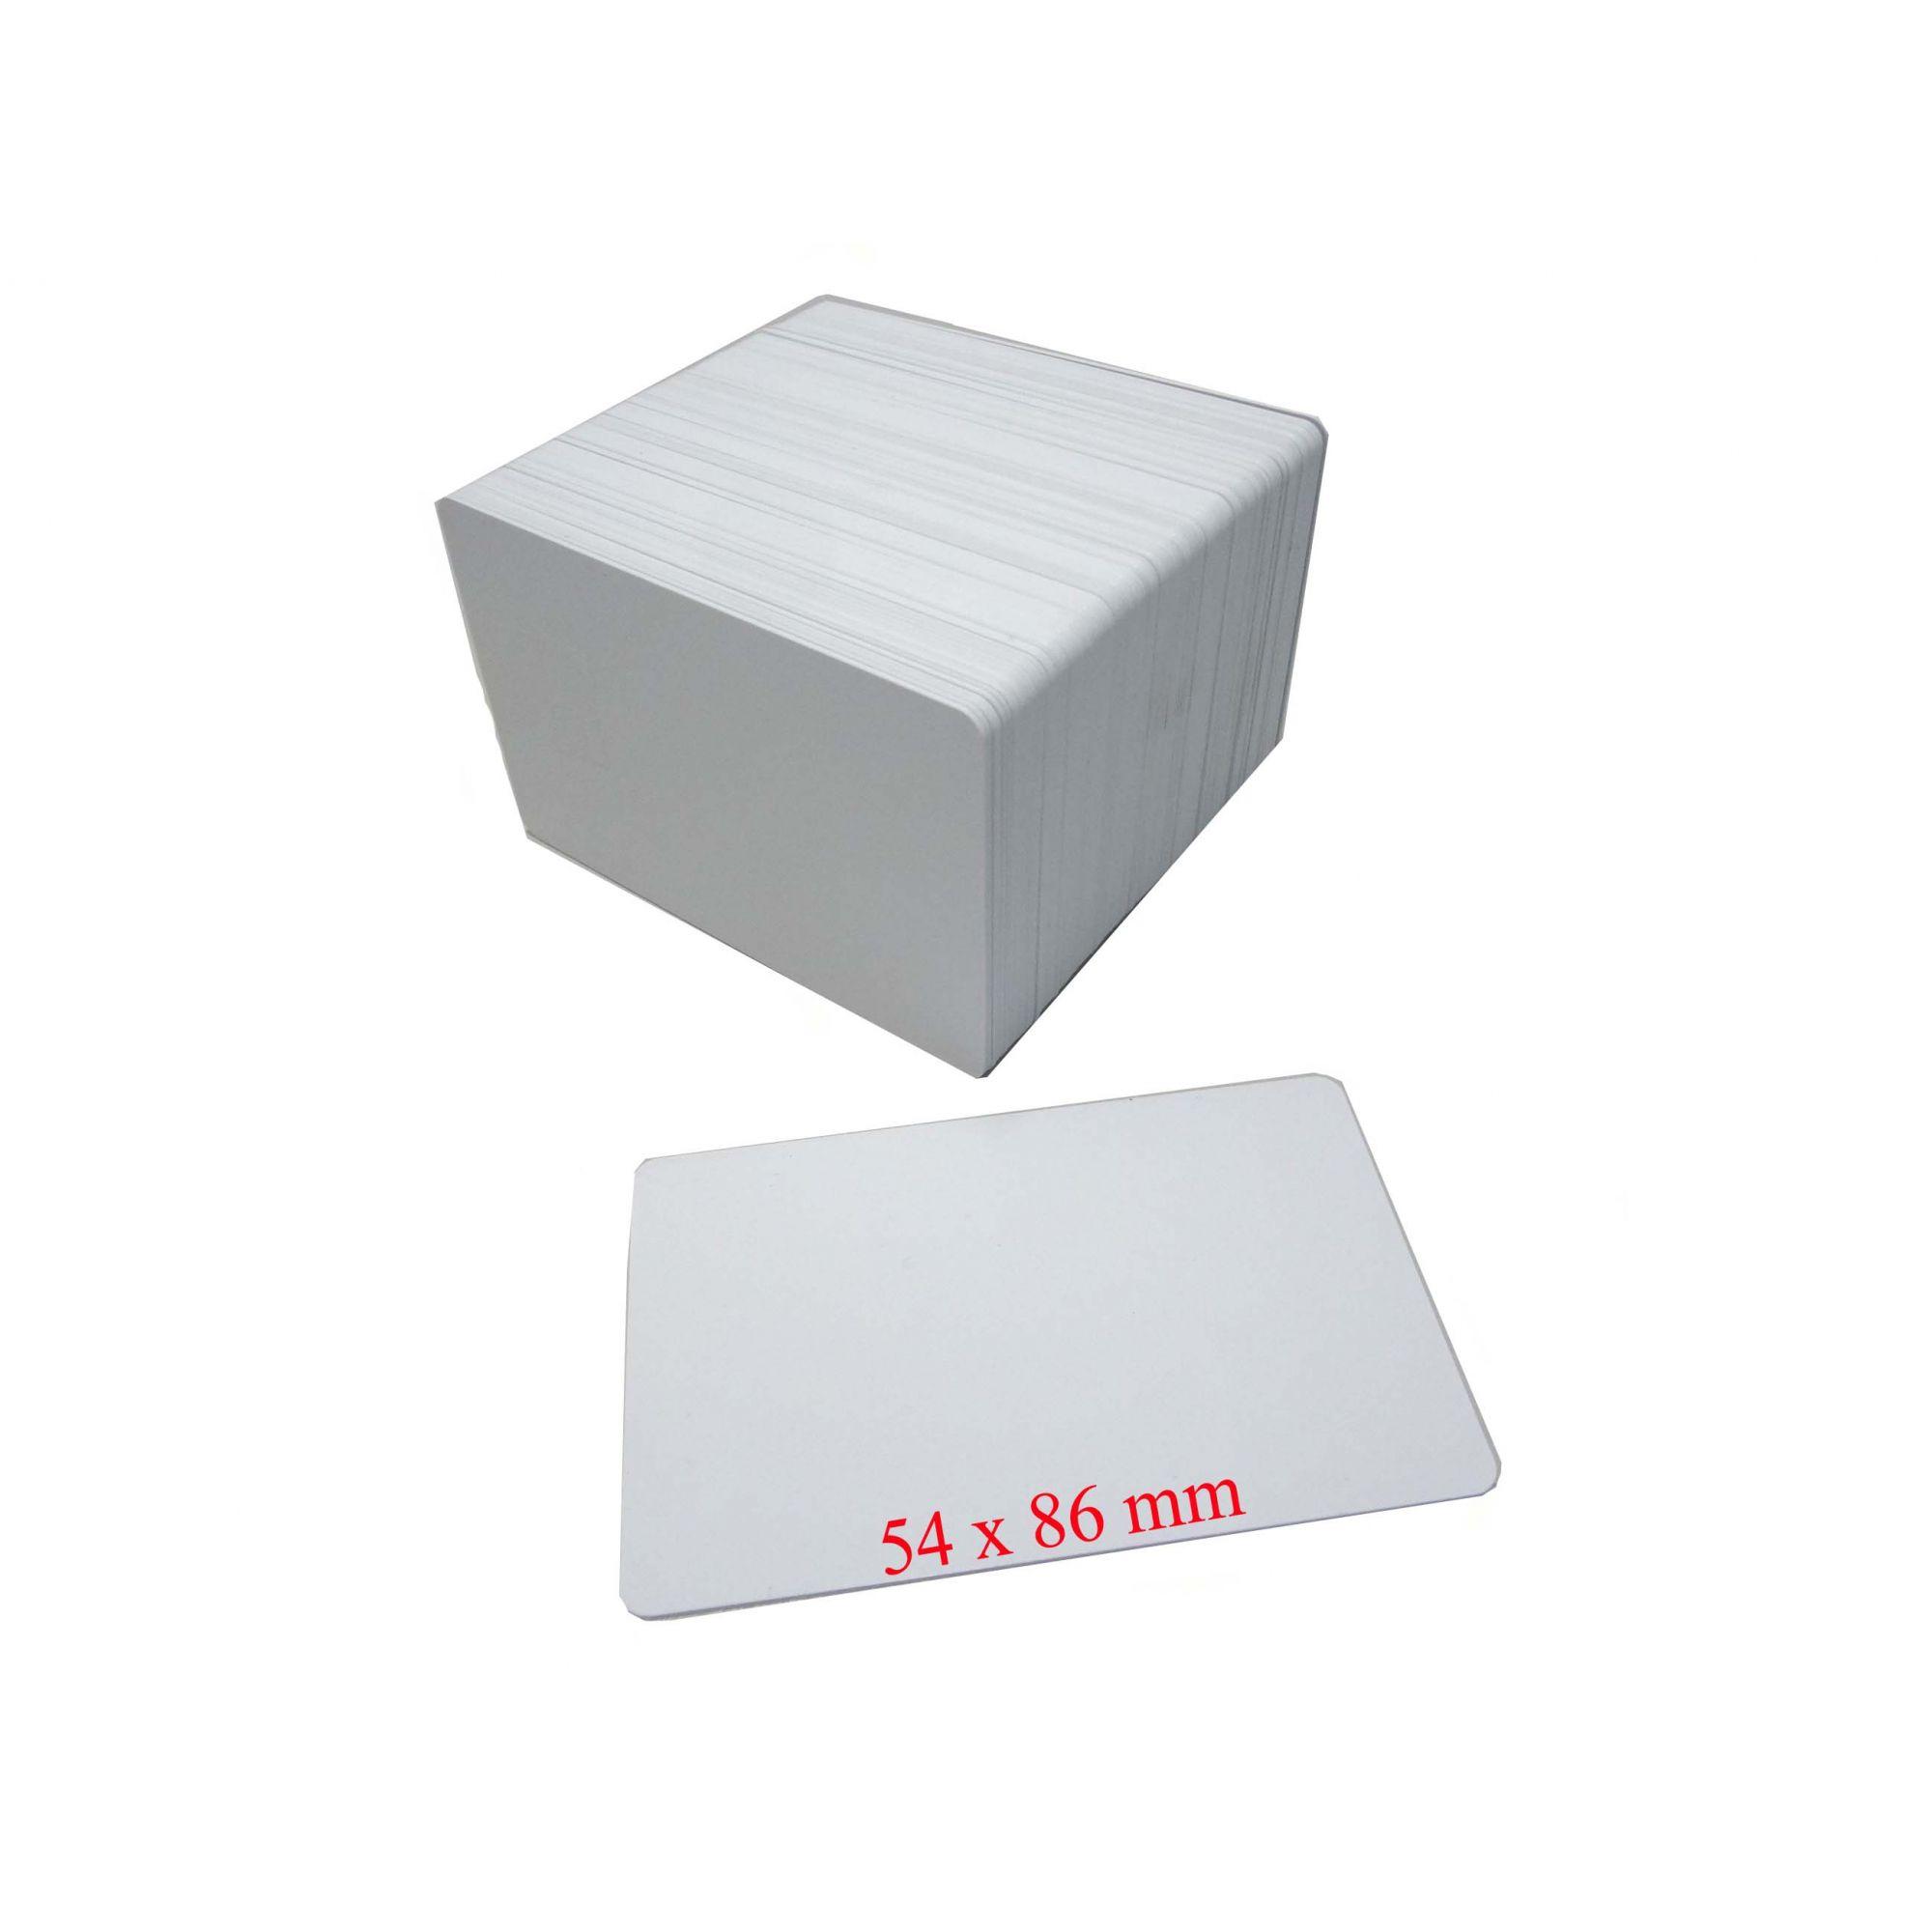 g) Cartão PVC Branco Mifare 1K Espessura 076 Tamanho 54 X 86 mm